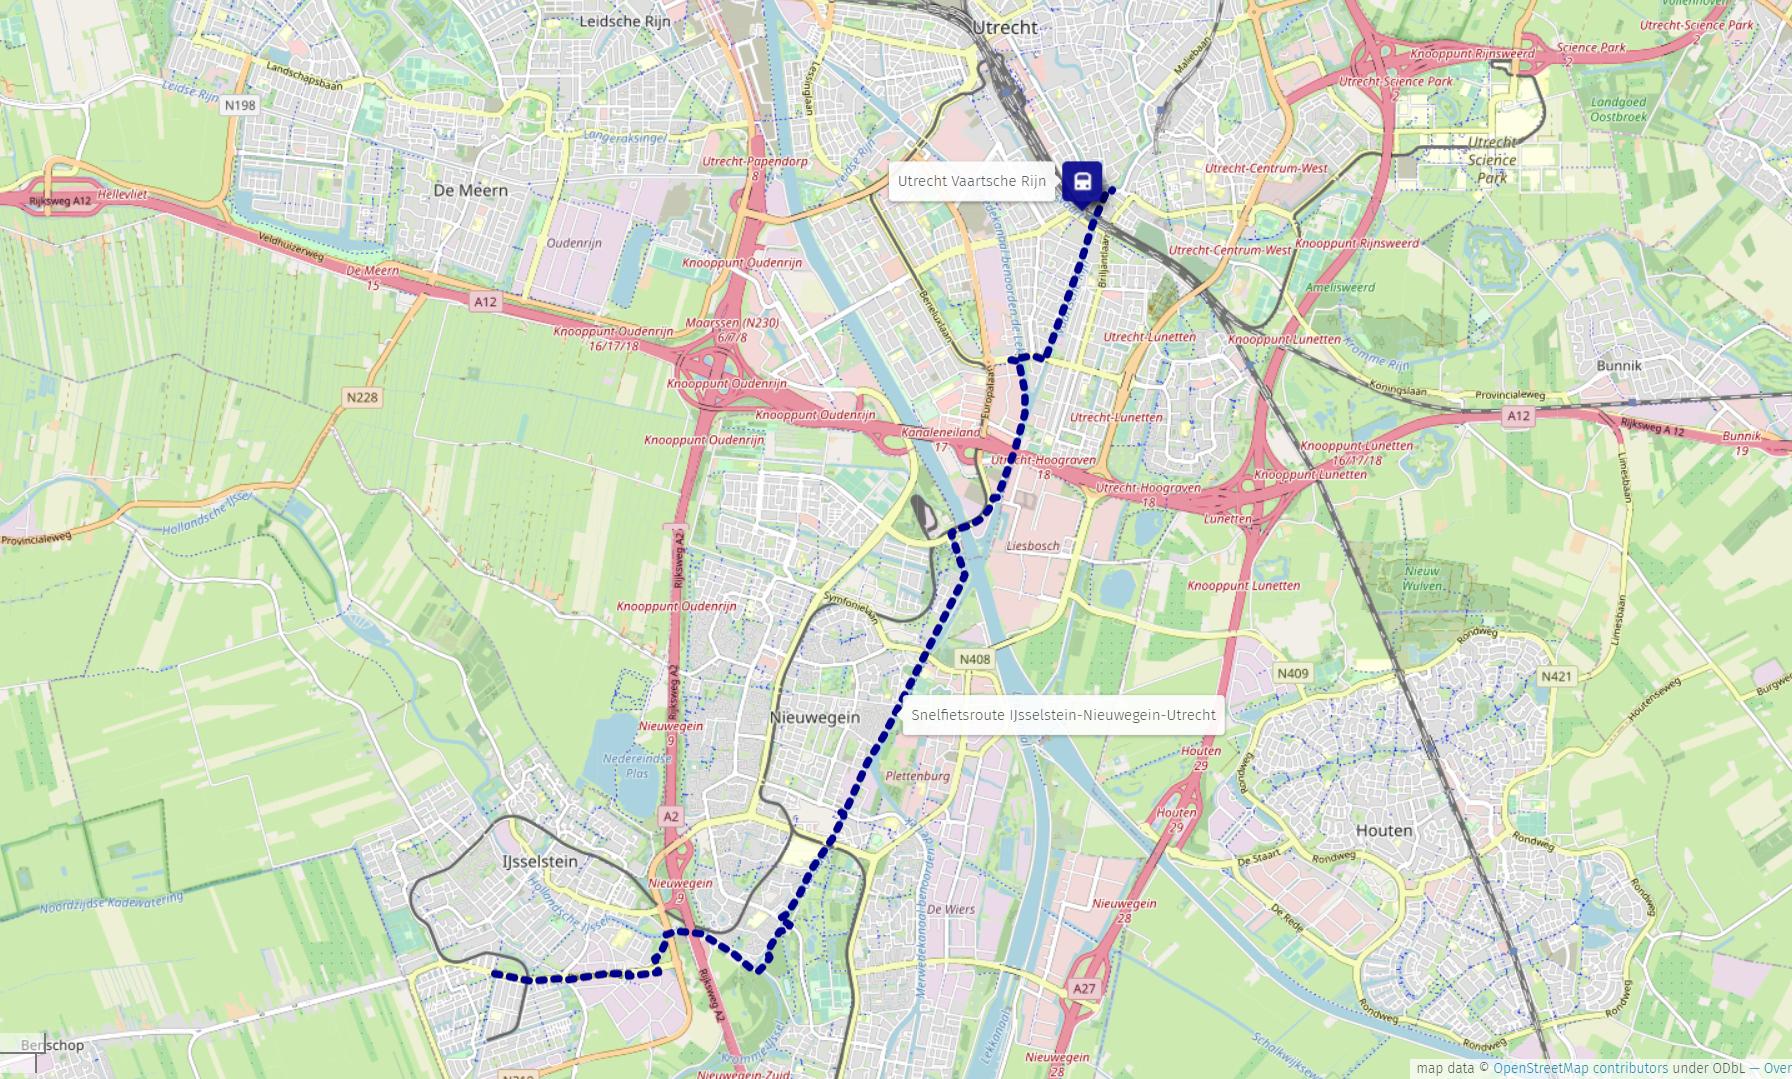 Snelfietsroute IJsselstein - Nieuwegein - Utrecht - Wikipedia